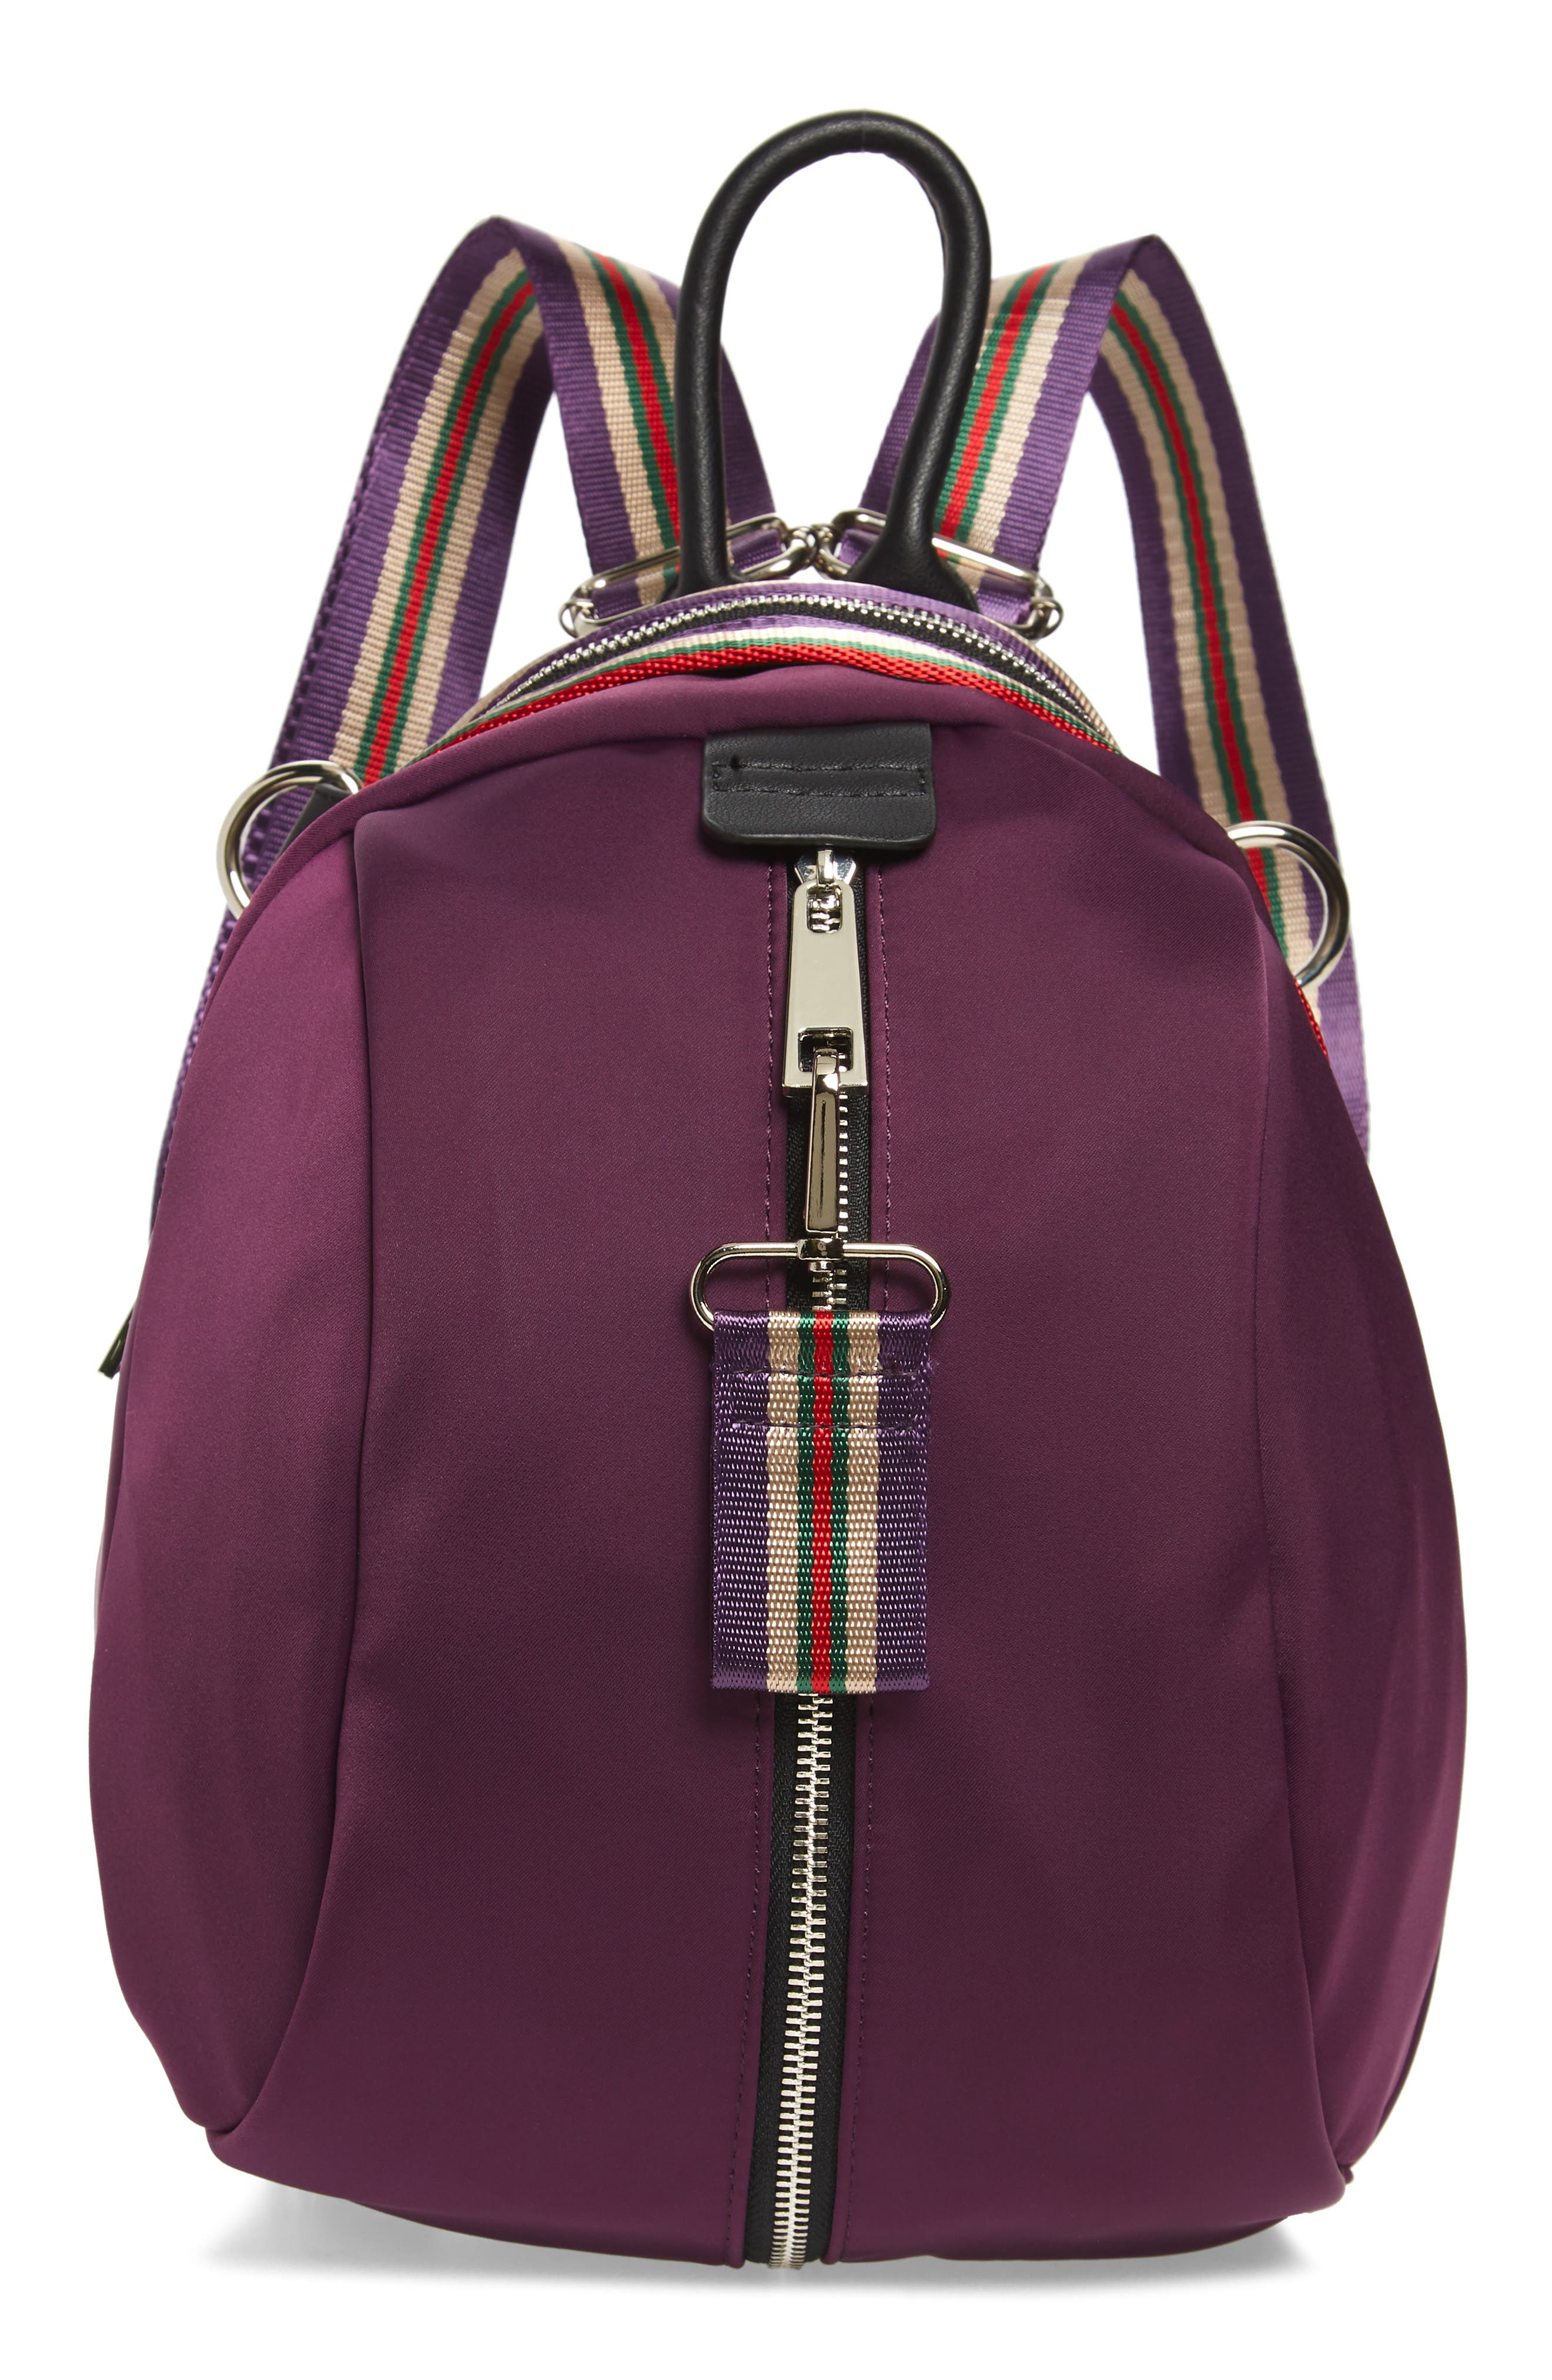 Satin Nylon & Webbing Convertible Backpack,                         Main,                         color, PURPLE